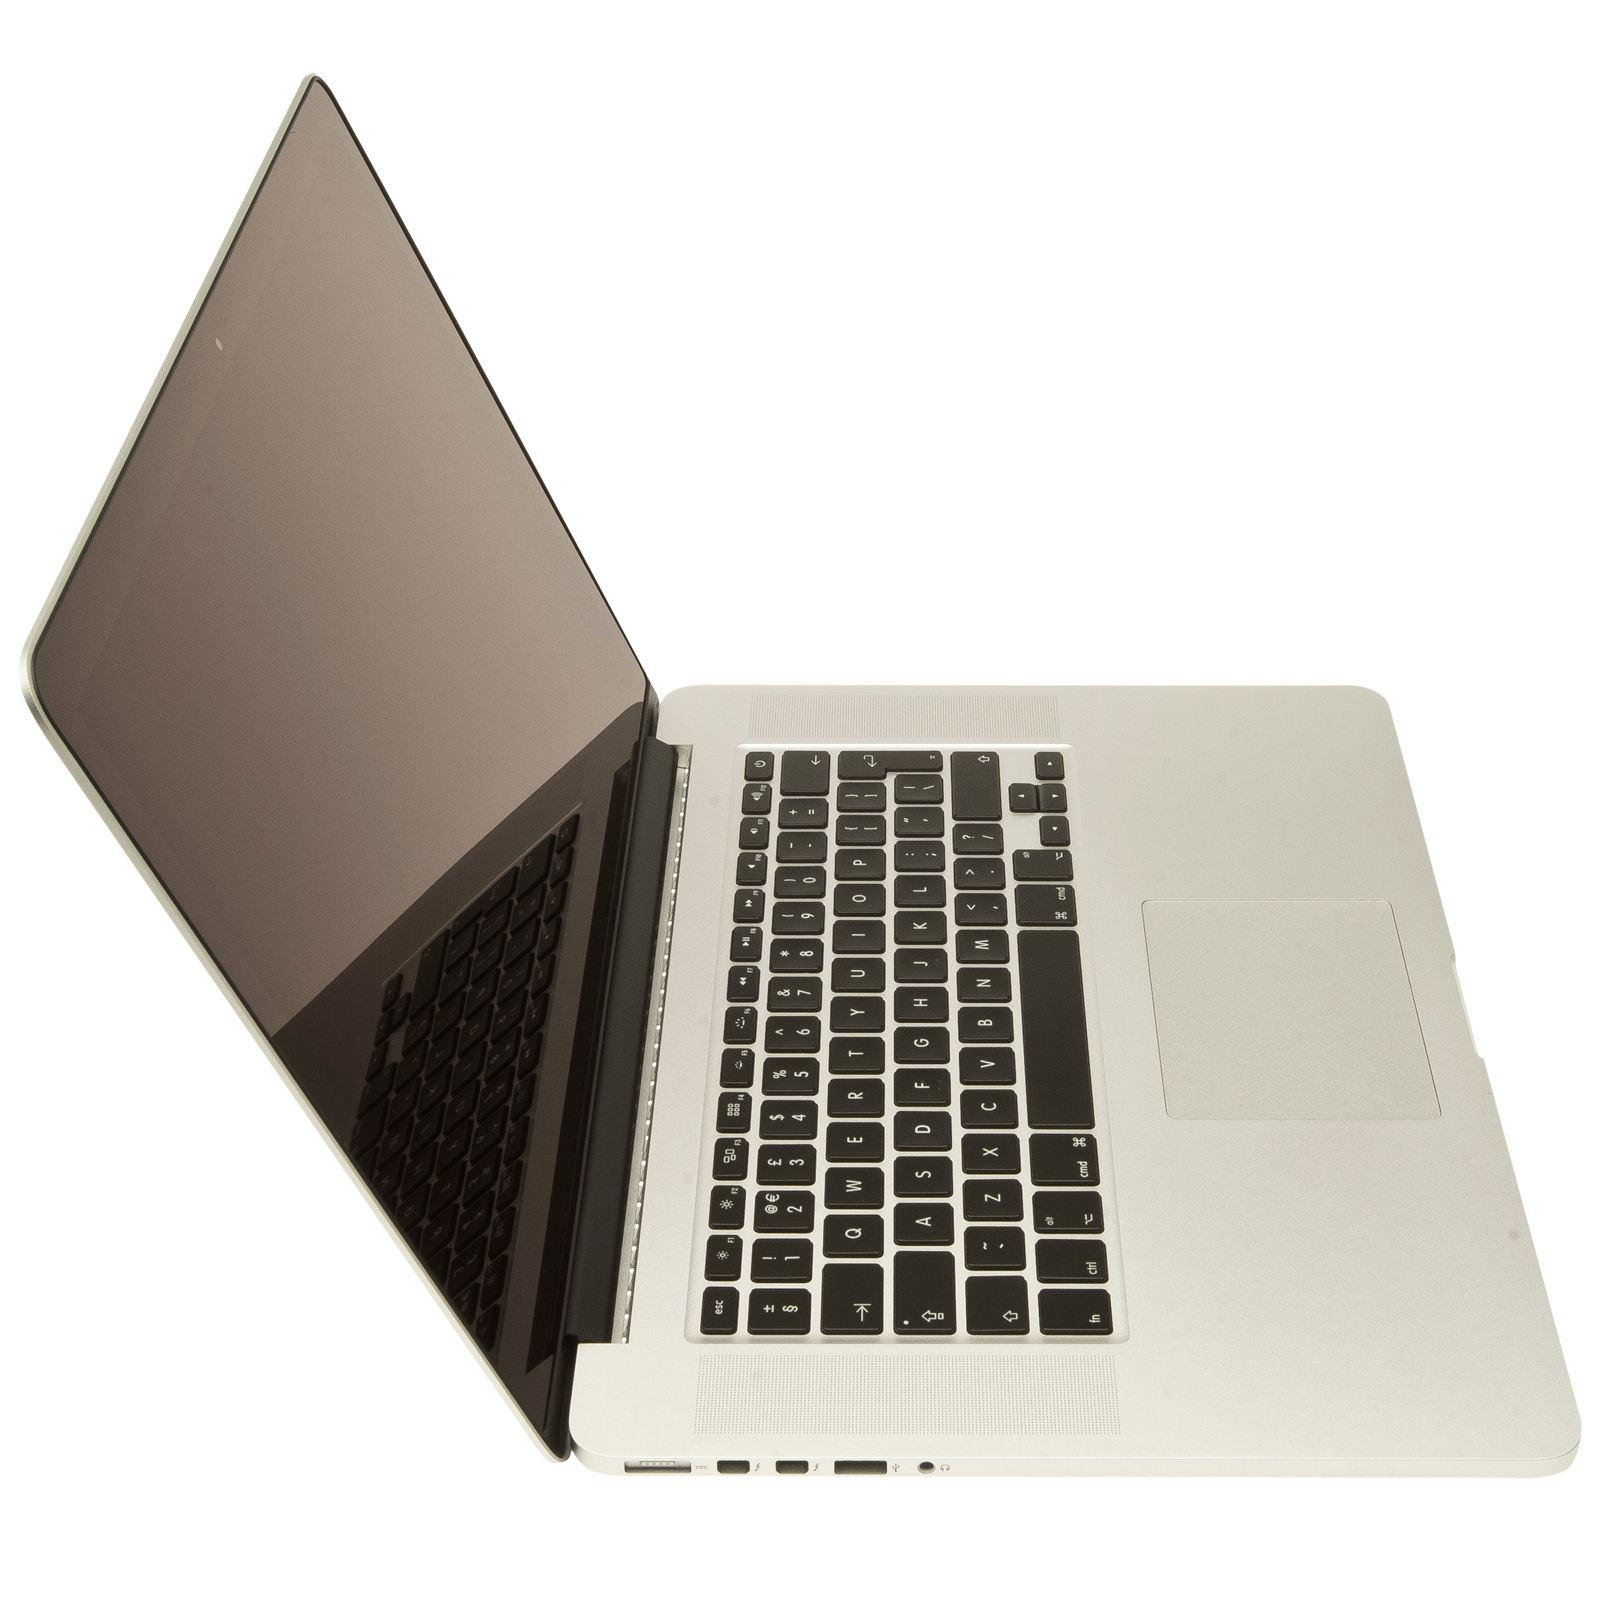 JUAL MacBook Pro Second 1 inch Retina Display SSD 1 MC1